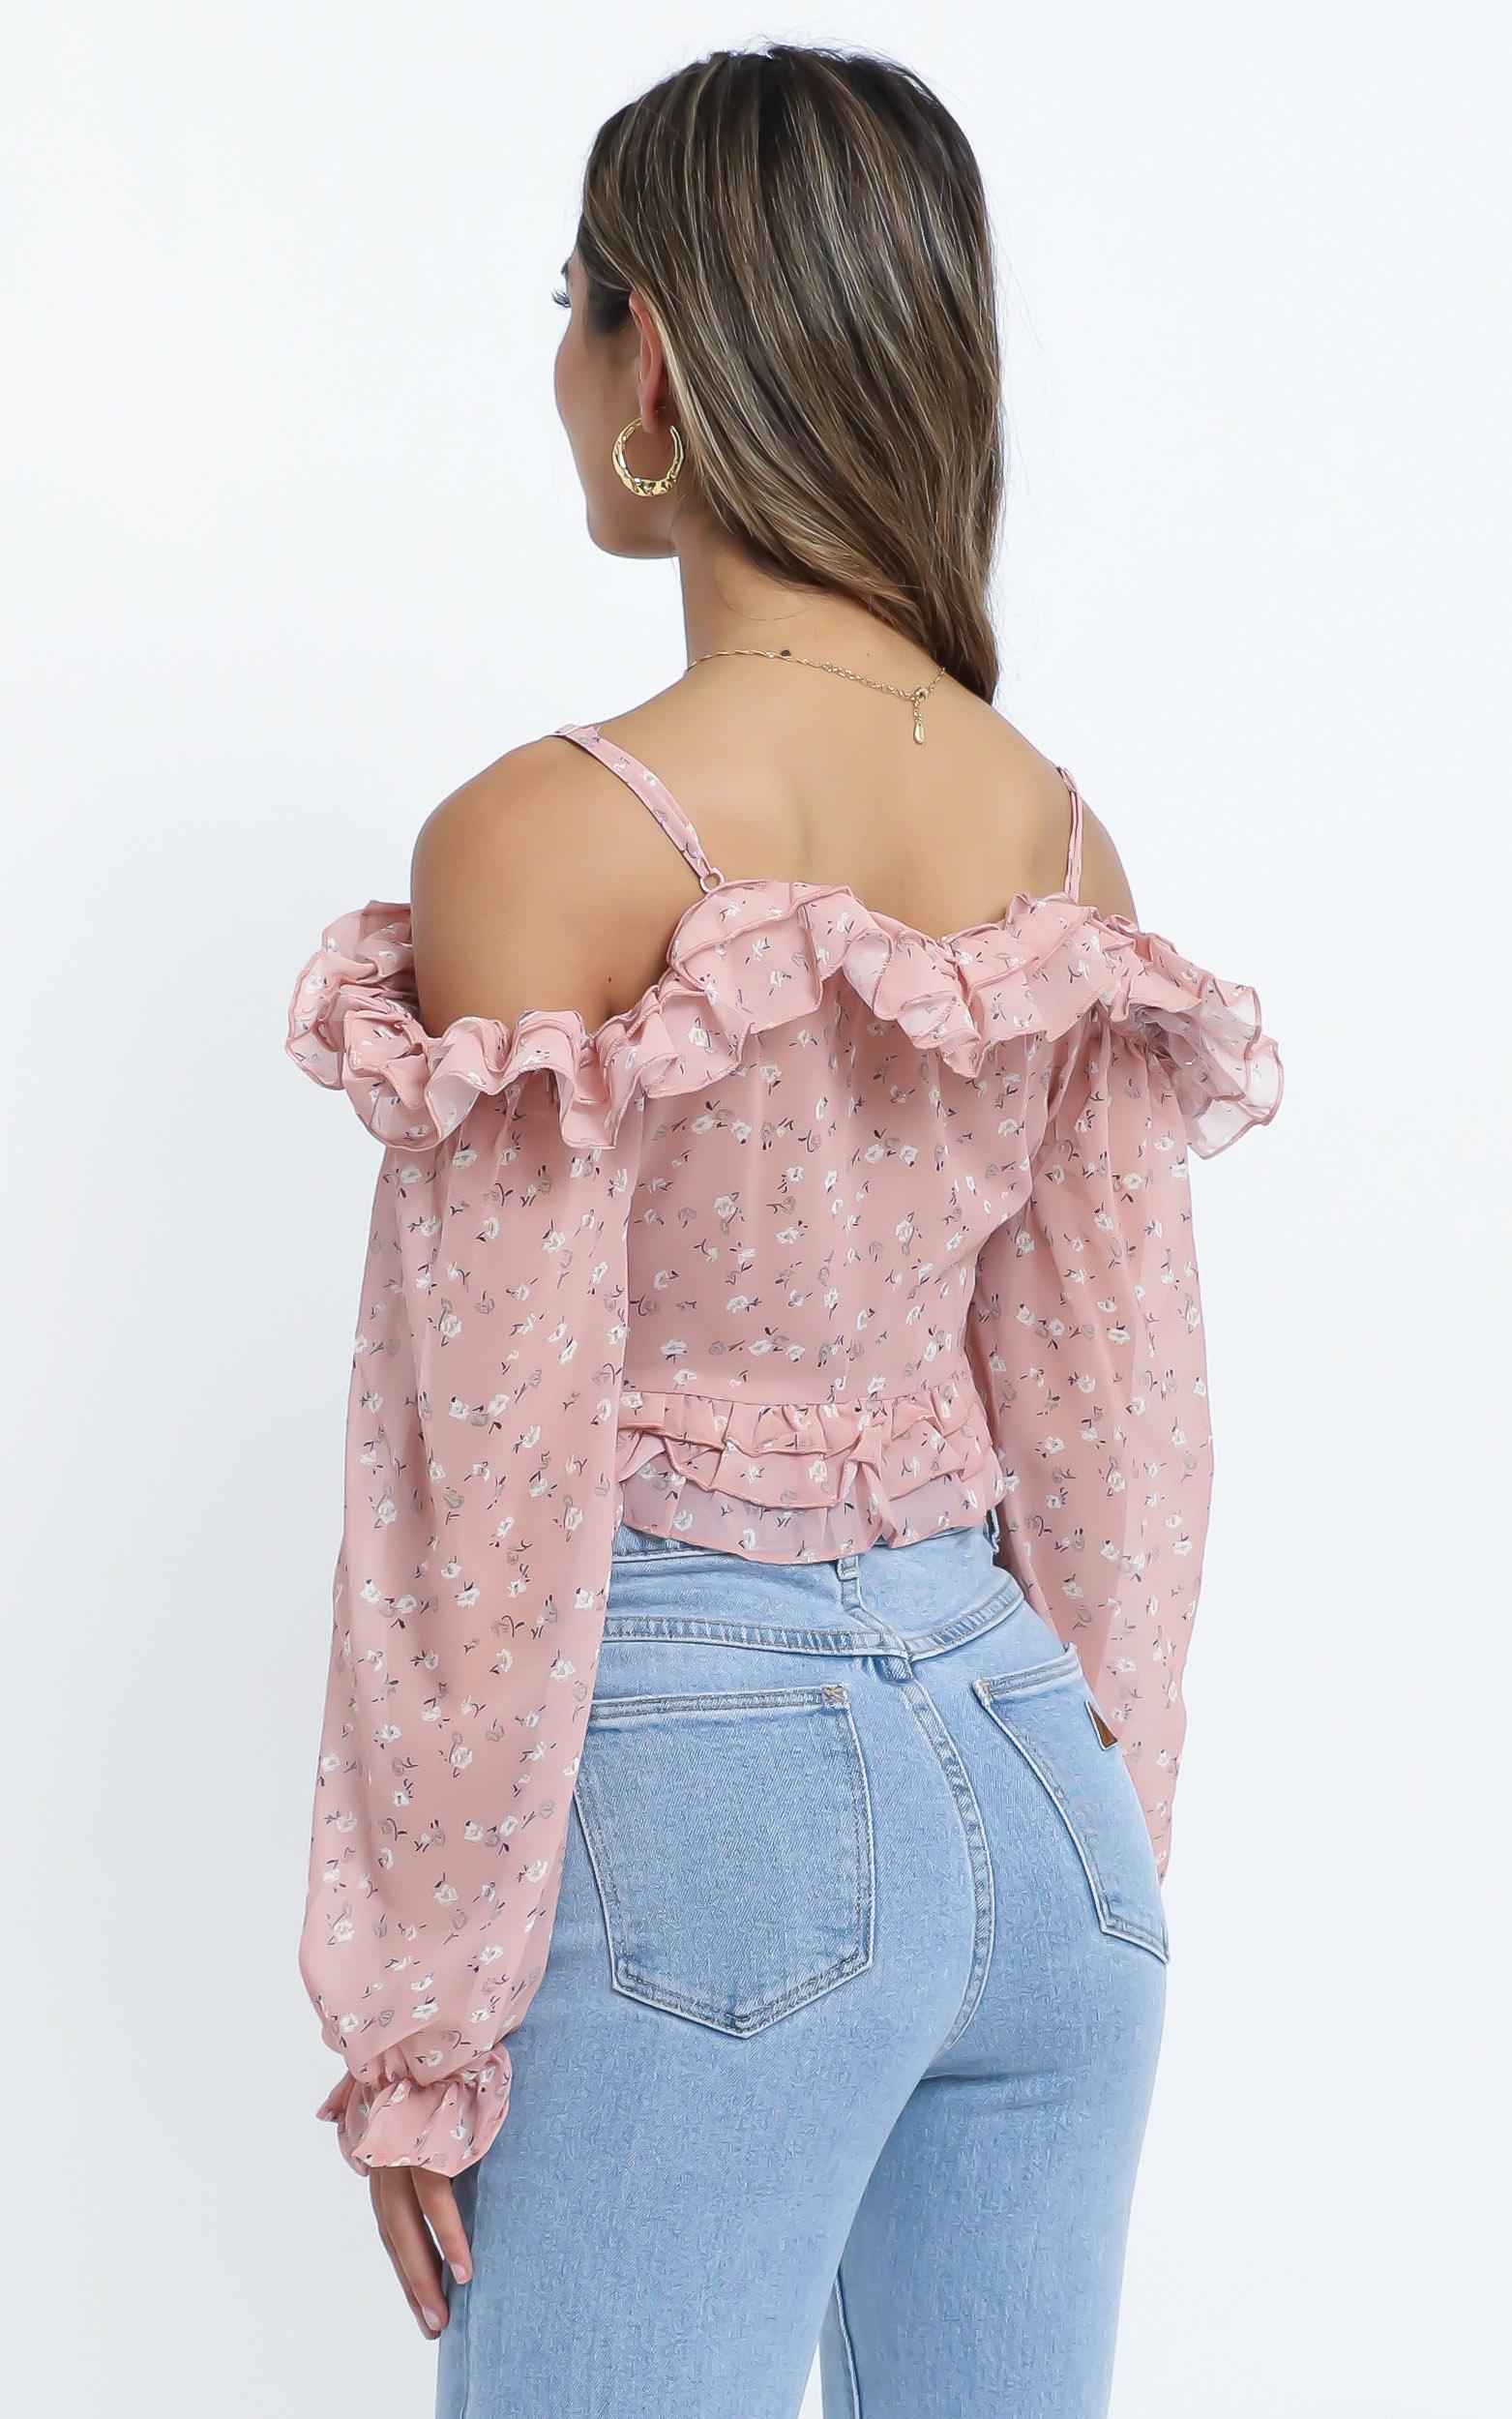 Ayala Top in Pink Floral - 14 (XL), Pink, hi-res image number null